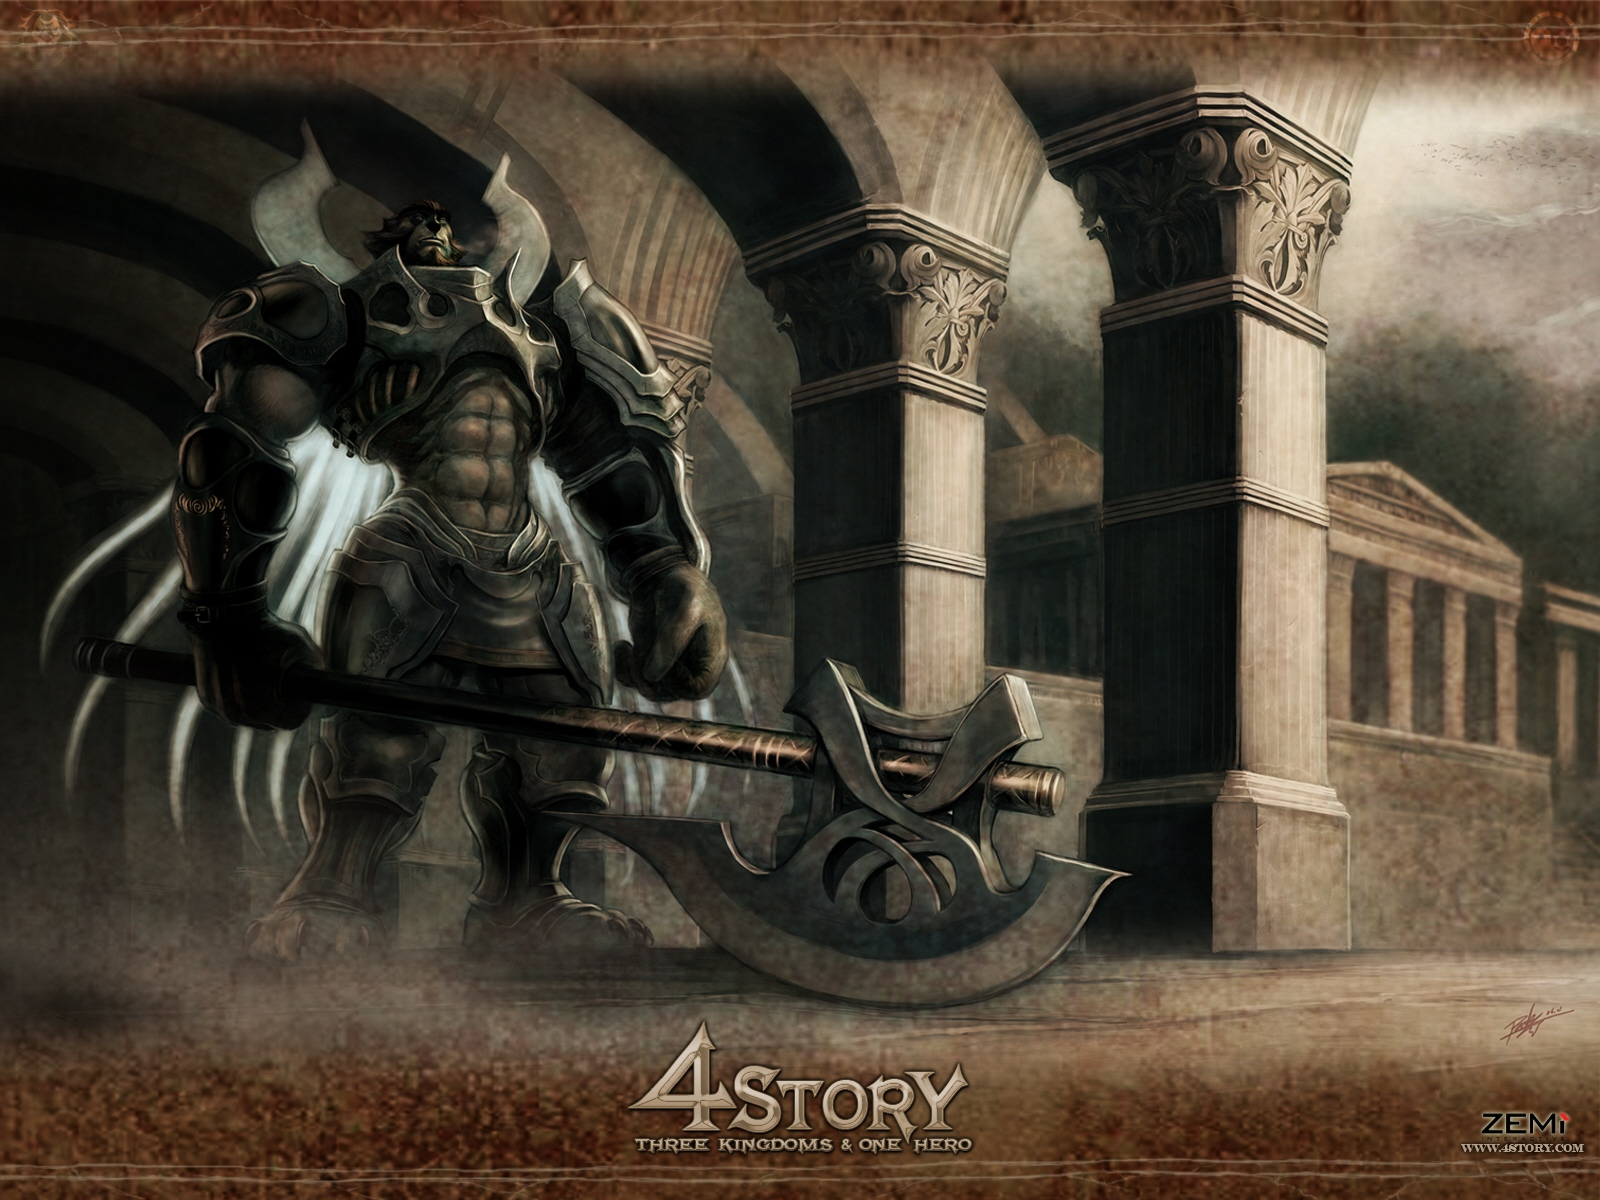 wp1_1600x1200.jpg - 4Story: Three Kingdoms & One Hero